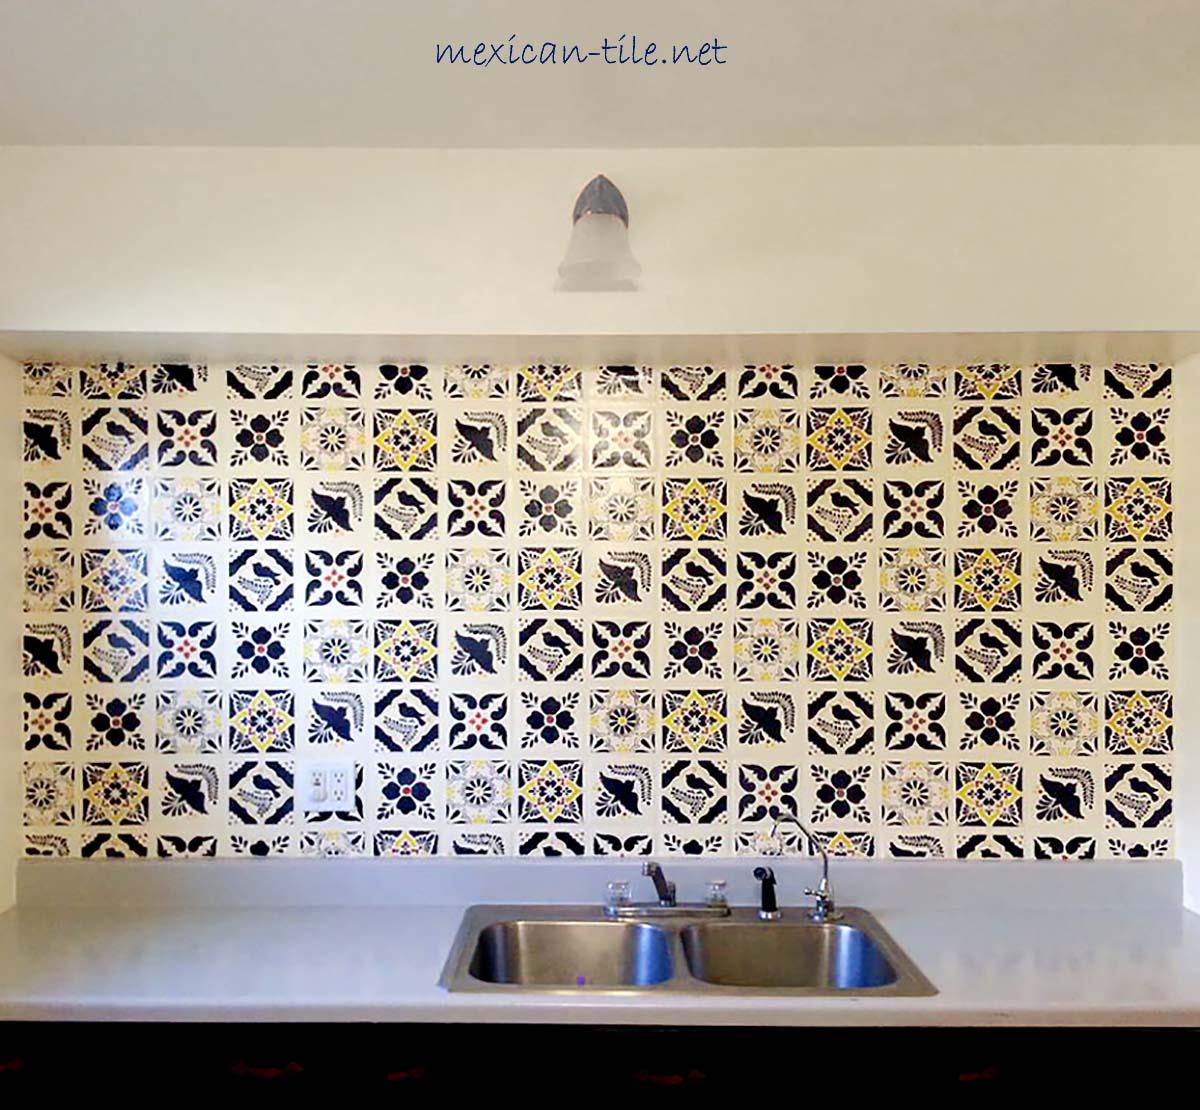 mosaic tile backsplash mexican tiles